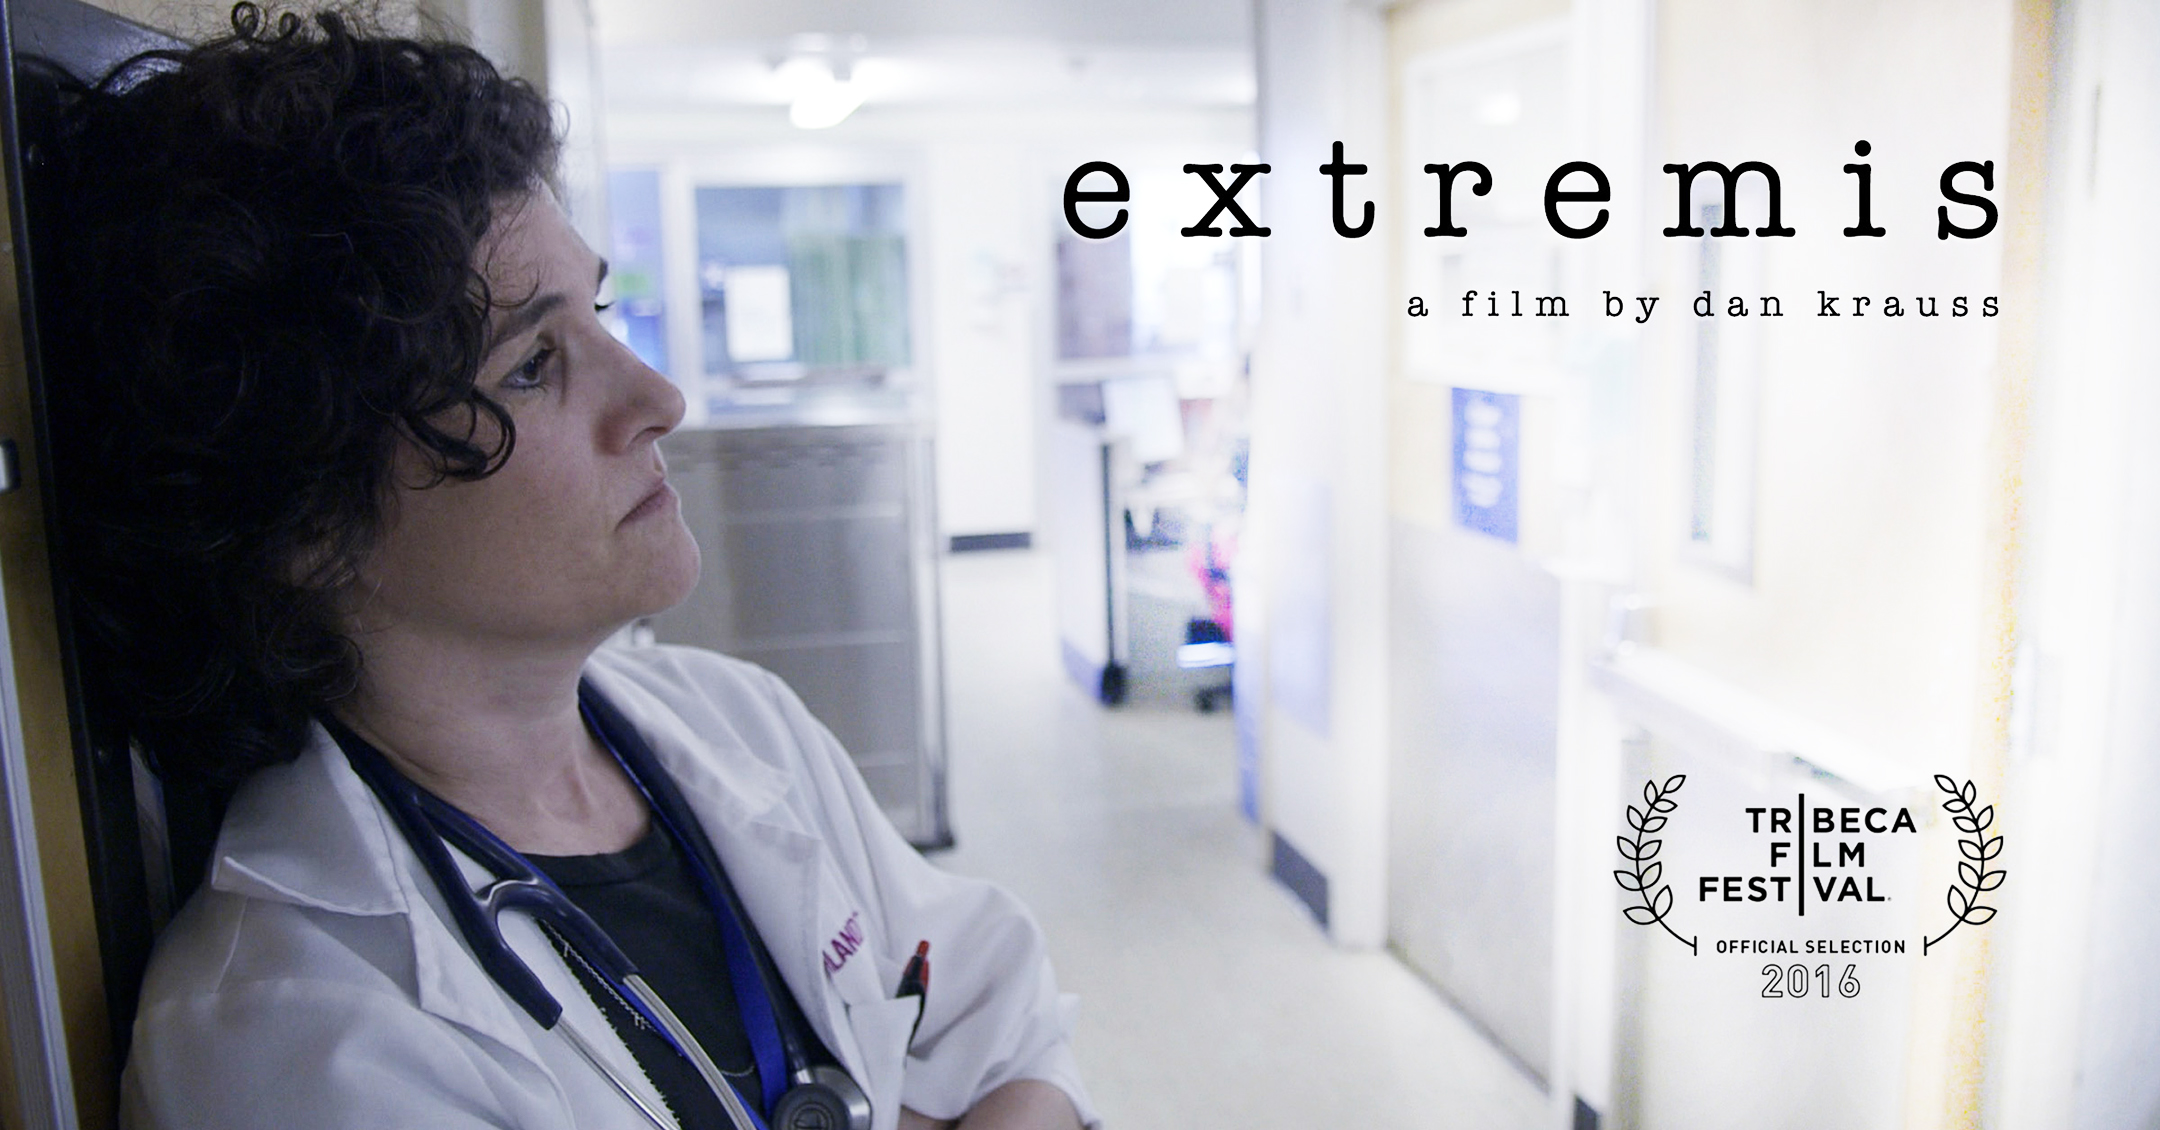 extremis_social_poster_hires_JESSICA-eventbrite.jpg